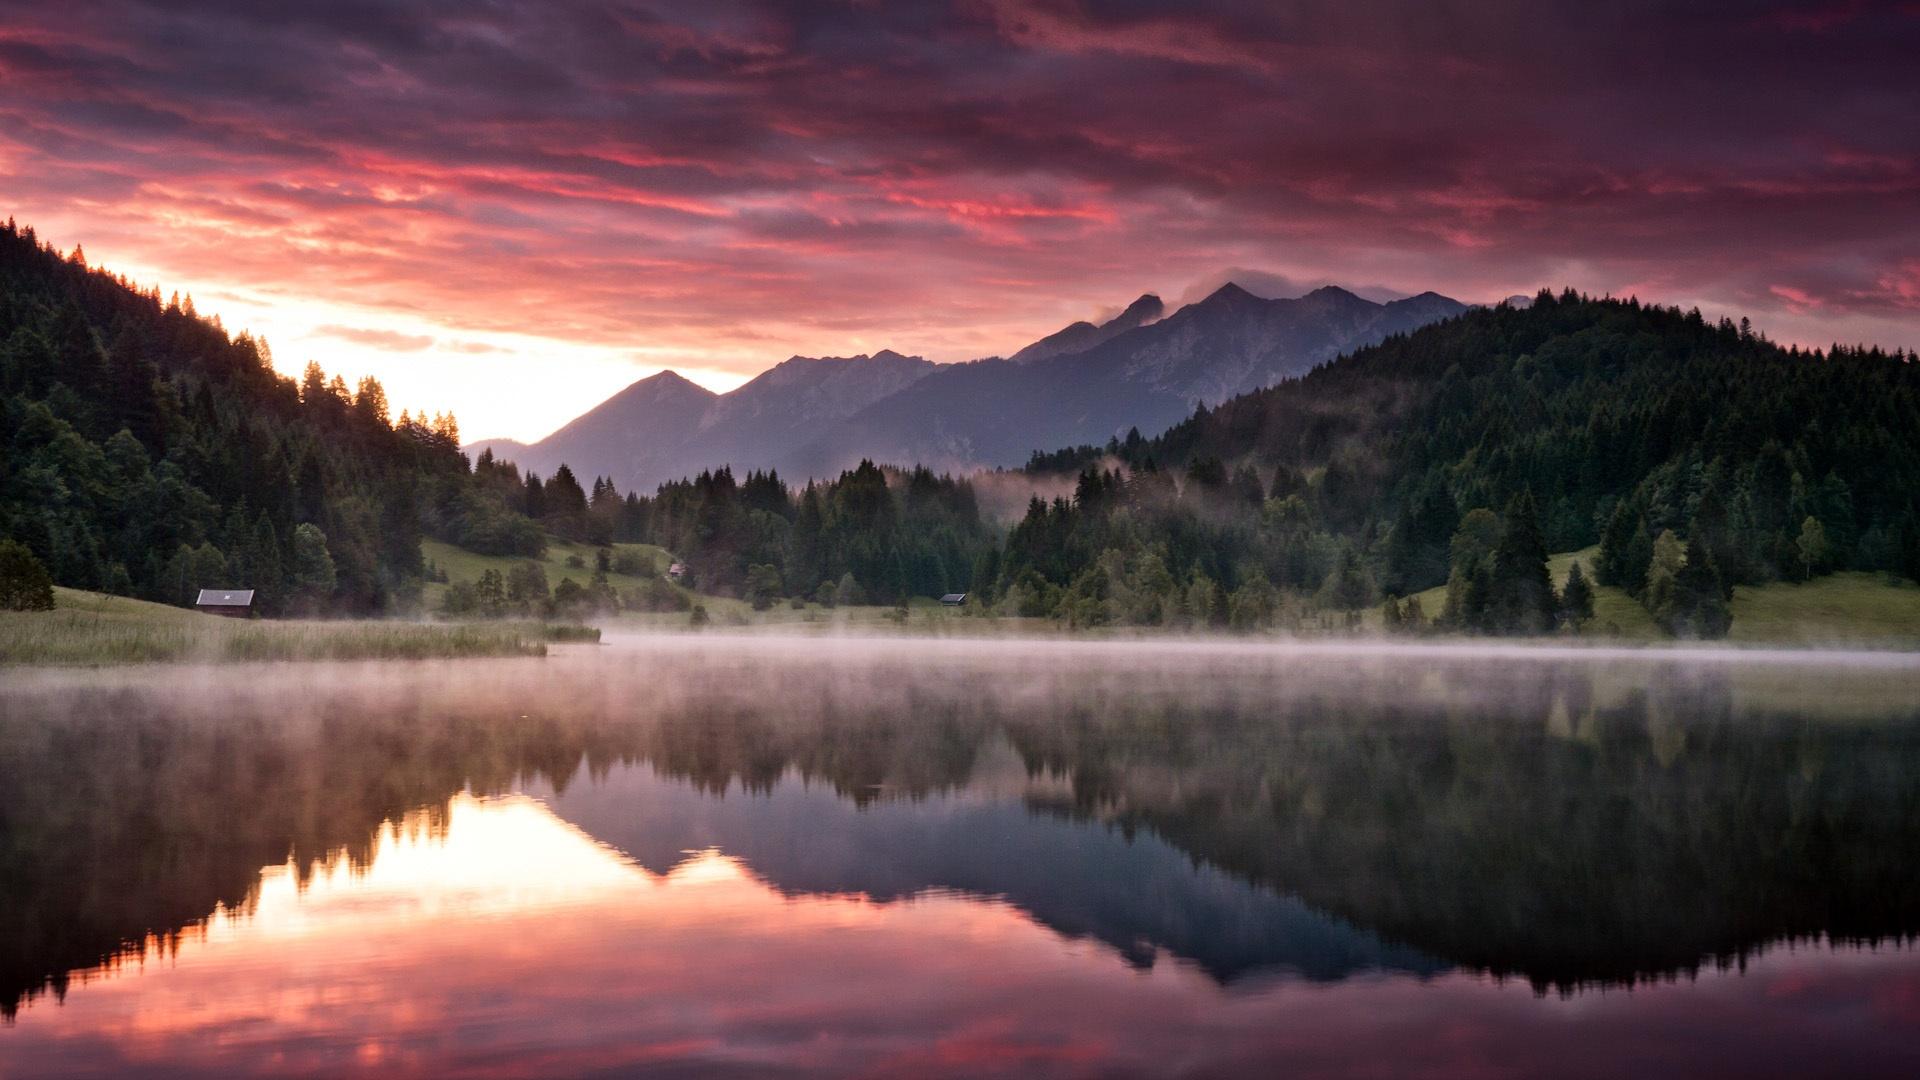 Горы, лес, озеро анонимно